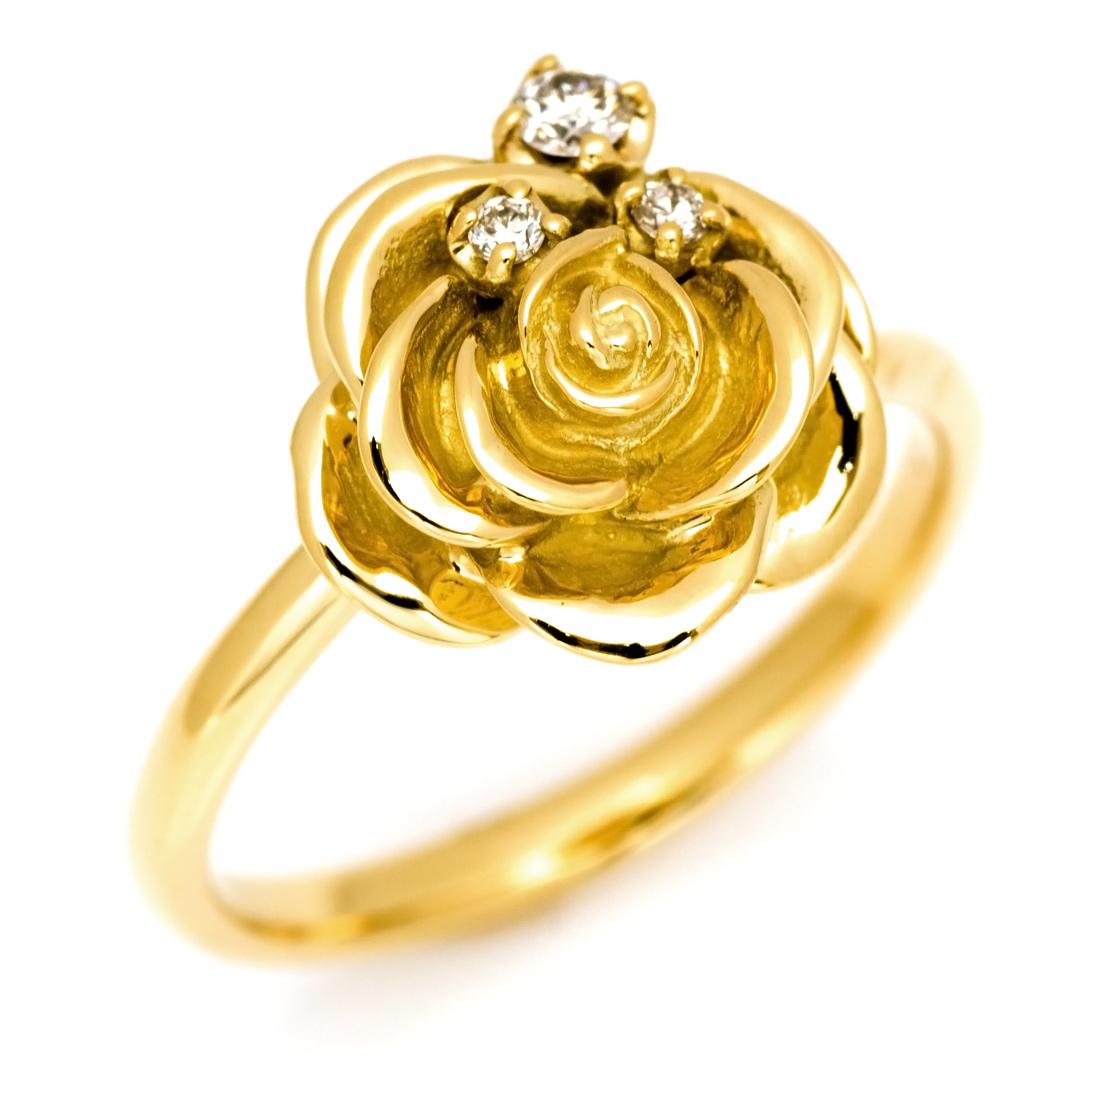 K18 バースストーン ローズ リング 「la vie en rose」 指輪 ゴールド 18K 18金 バラ 薔薇 フラワー 花 誕生石 バースストーン 刻印 文字入れ メッセージ ギフト 贈り物 ピンキーリング対応可能